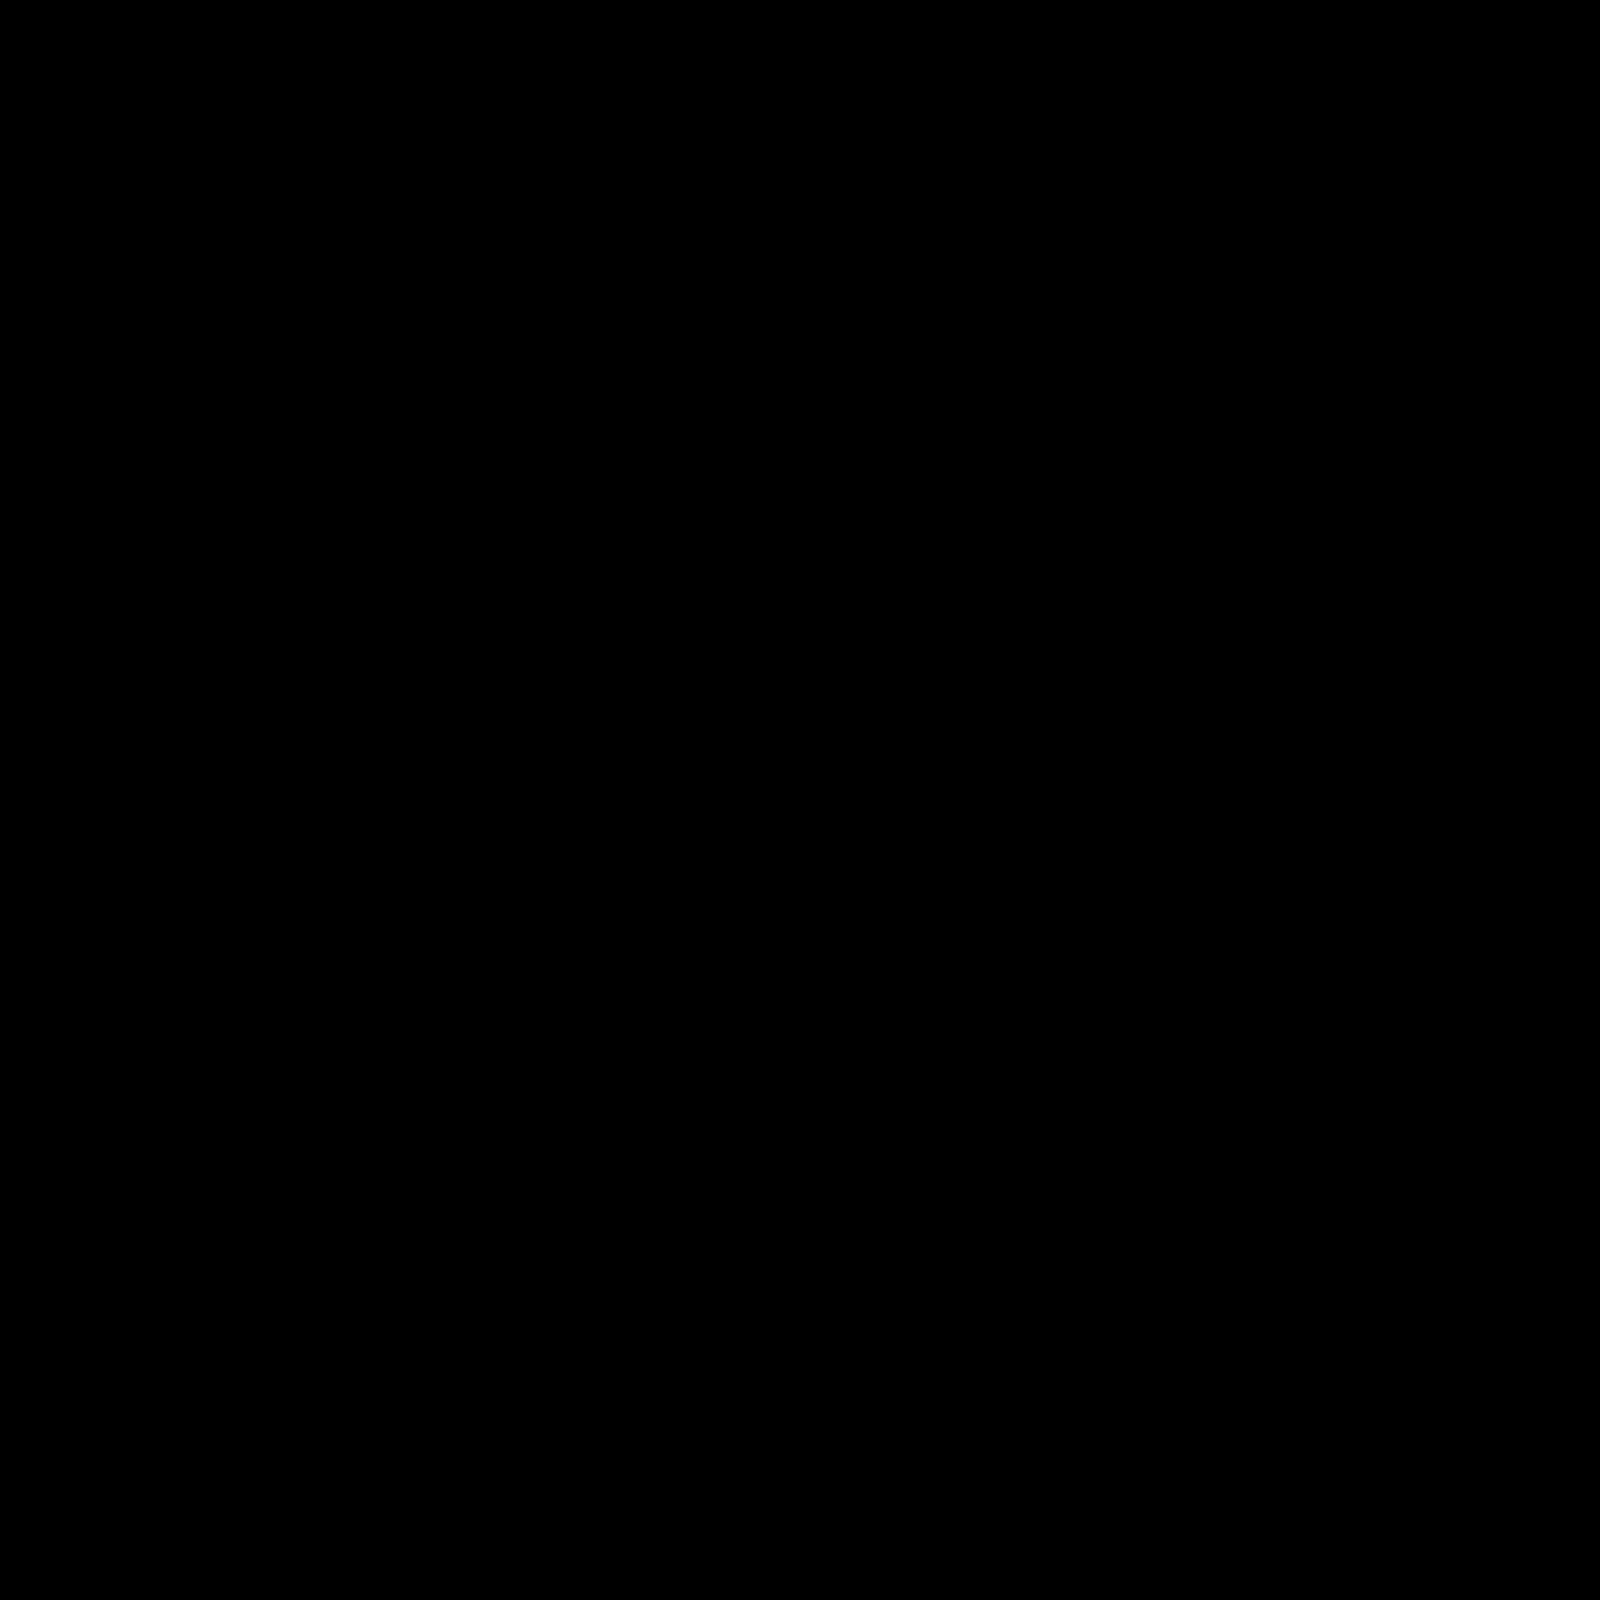 Общий текст icon